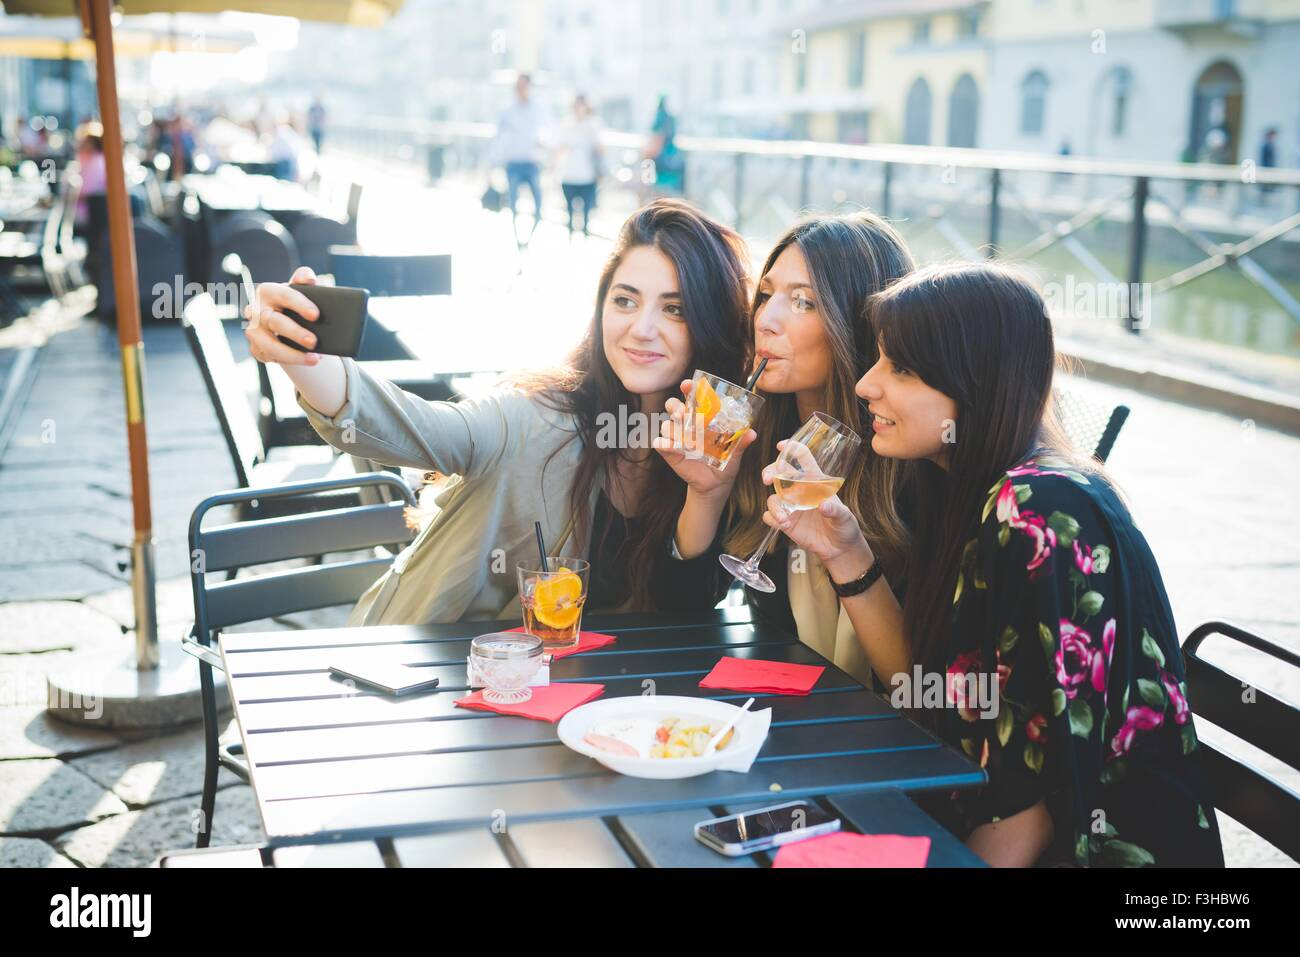 Tre giovani donne in posa per smartphone selfie a waterfront cafe Immagini Stock